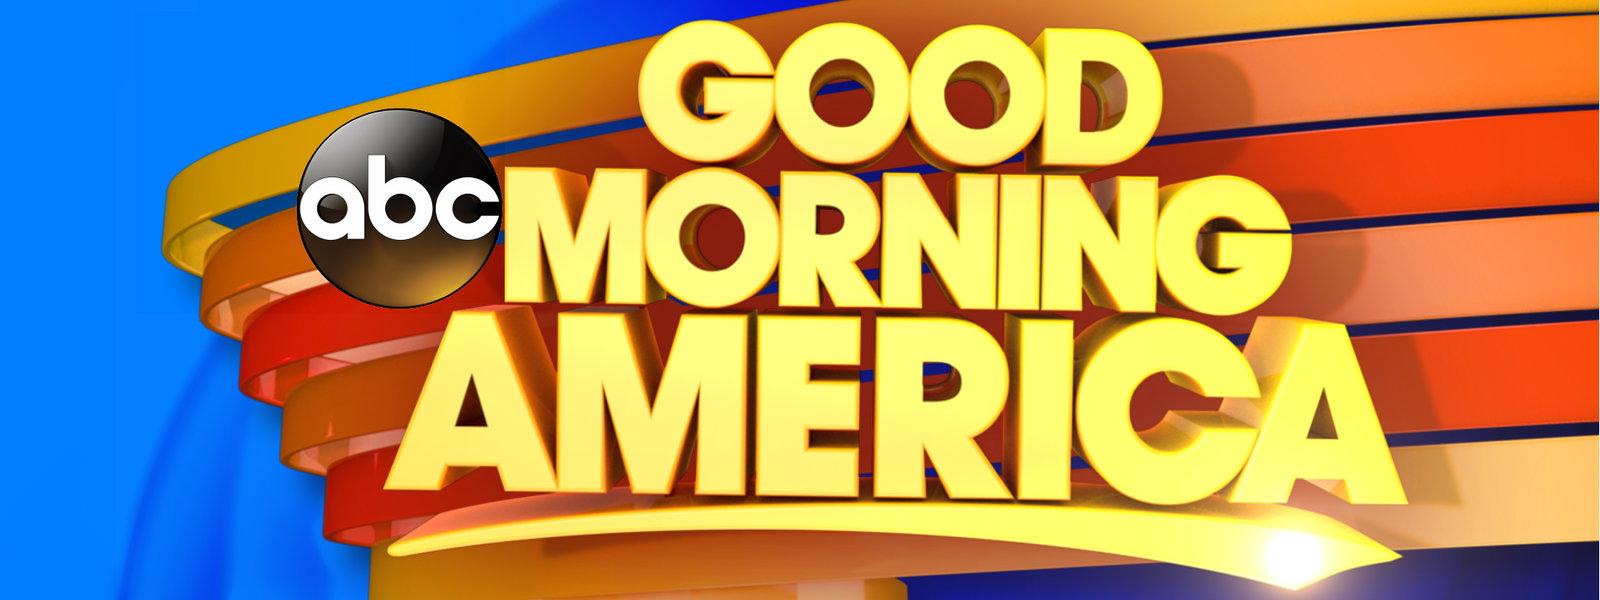 Good Morning America Nielsen Ratings : Good morning america talk show to celebrate year